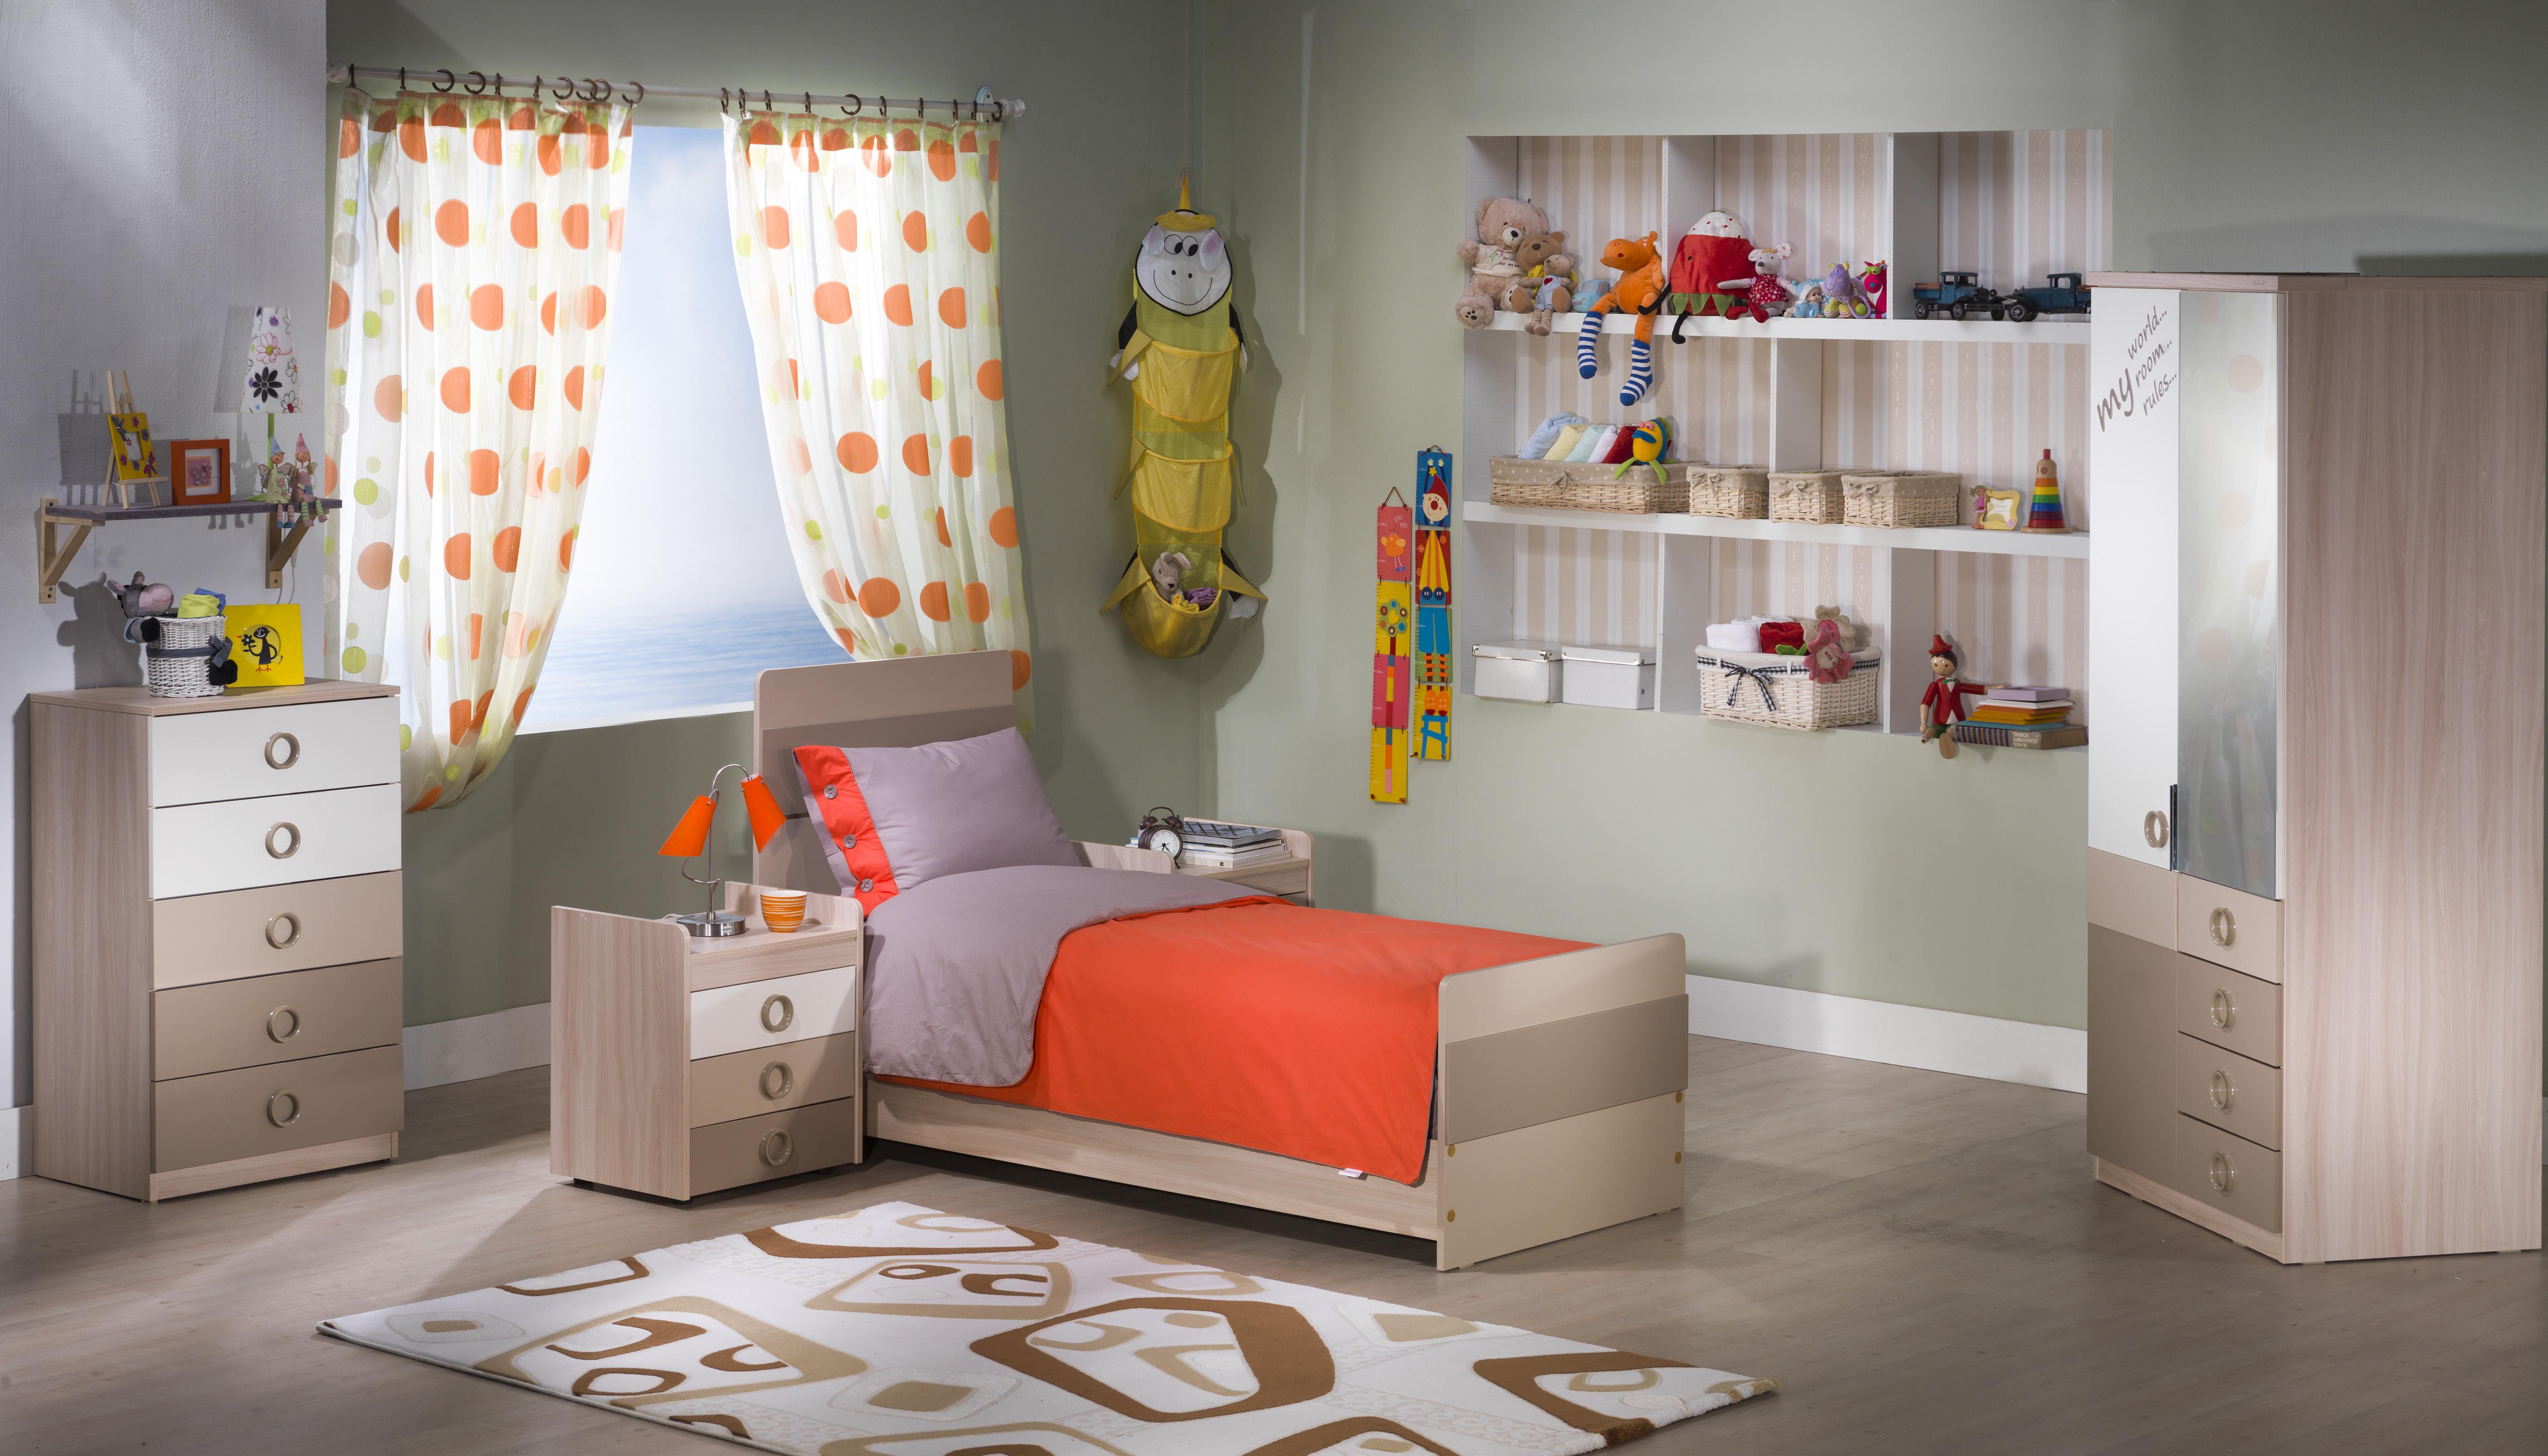 Portivo chambre enfant-3